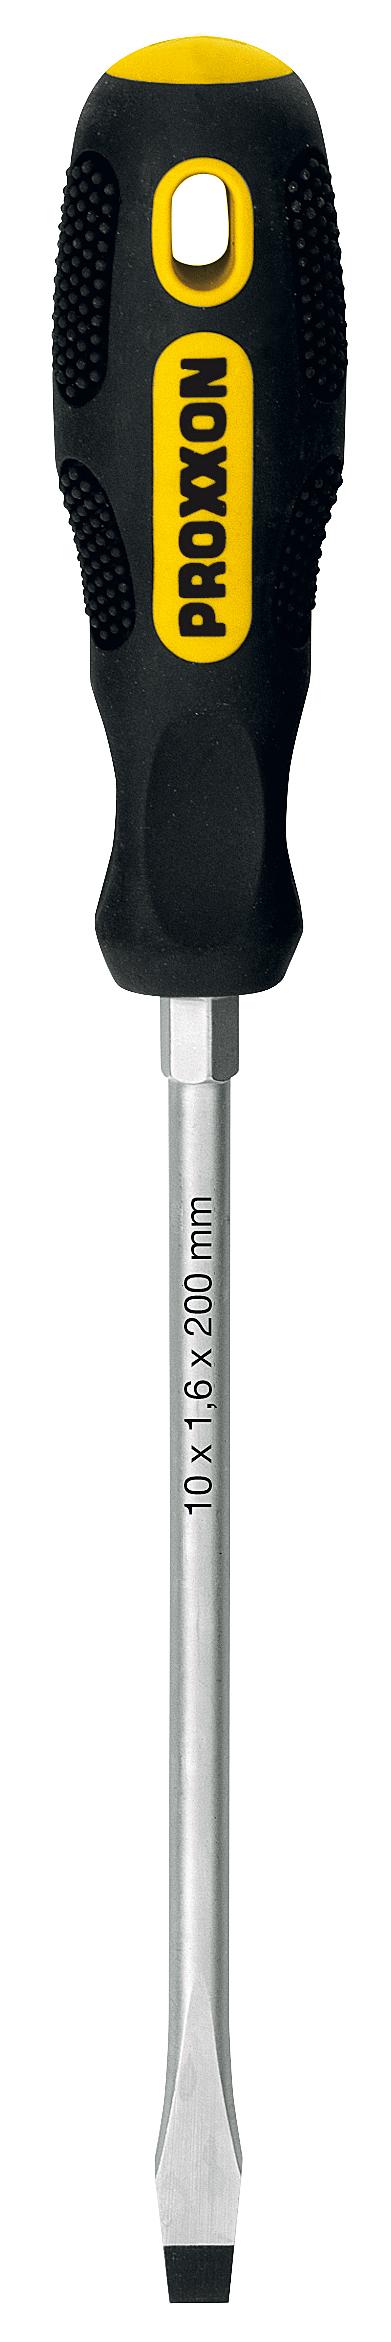 Proxxon FLEX-DOT-Schraubendreher Schlitz 8,0 x 1,2 x 175 mm